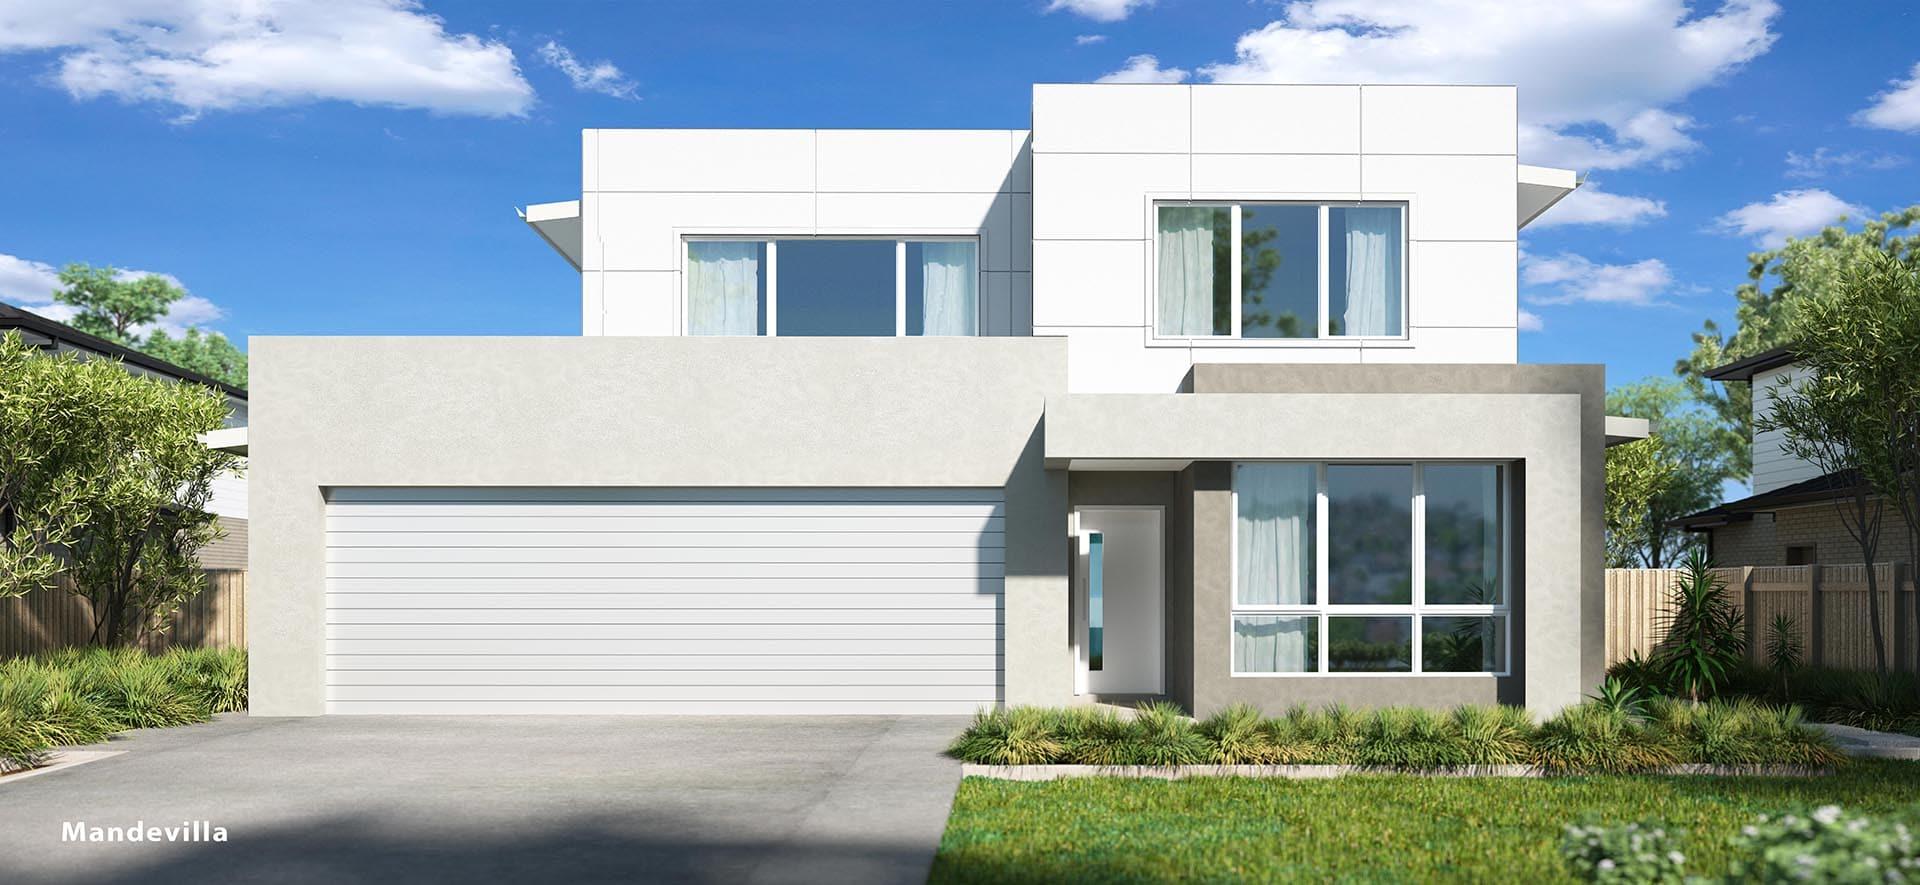 Mandevilla Double House Design